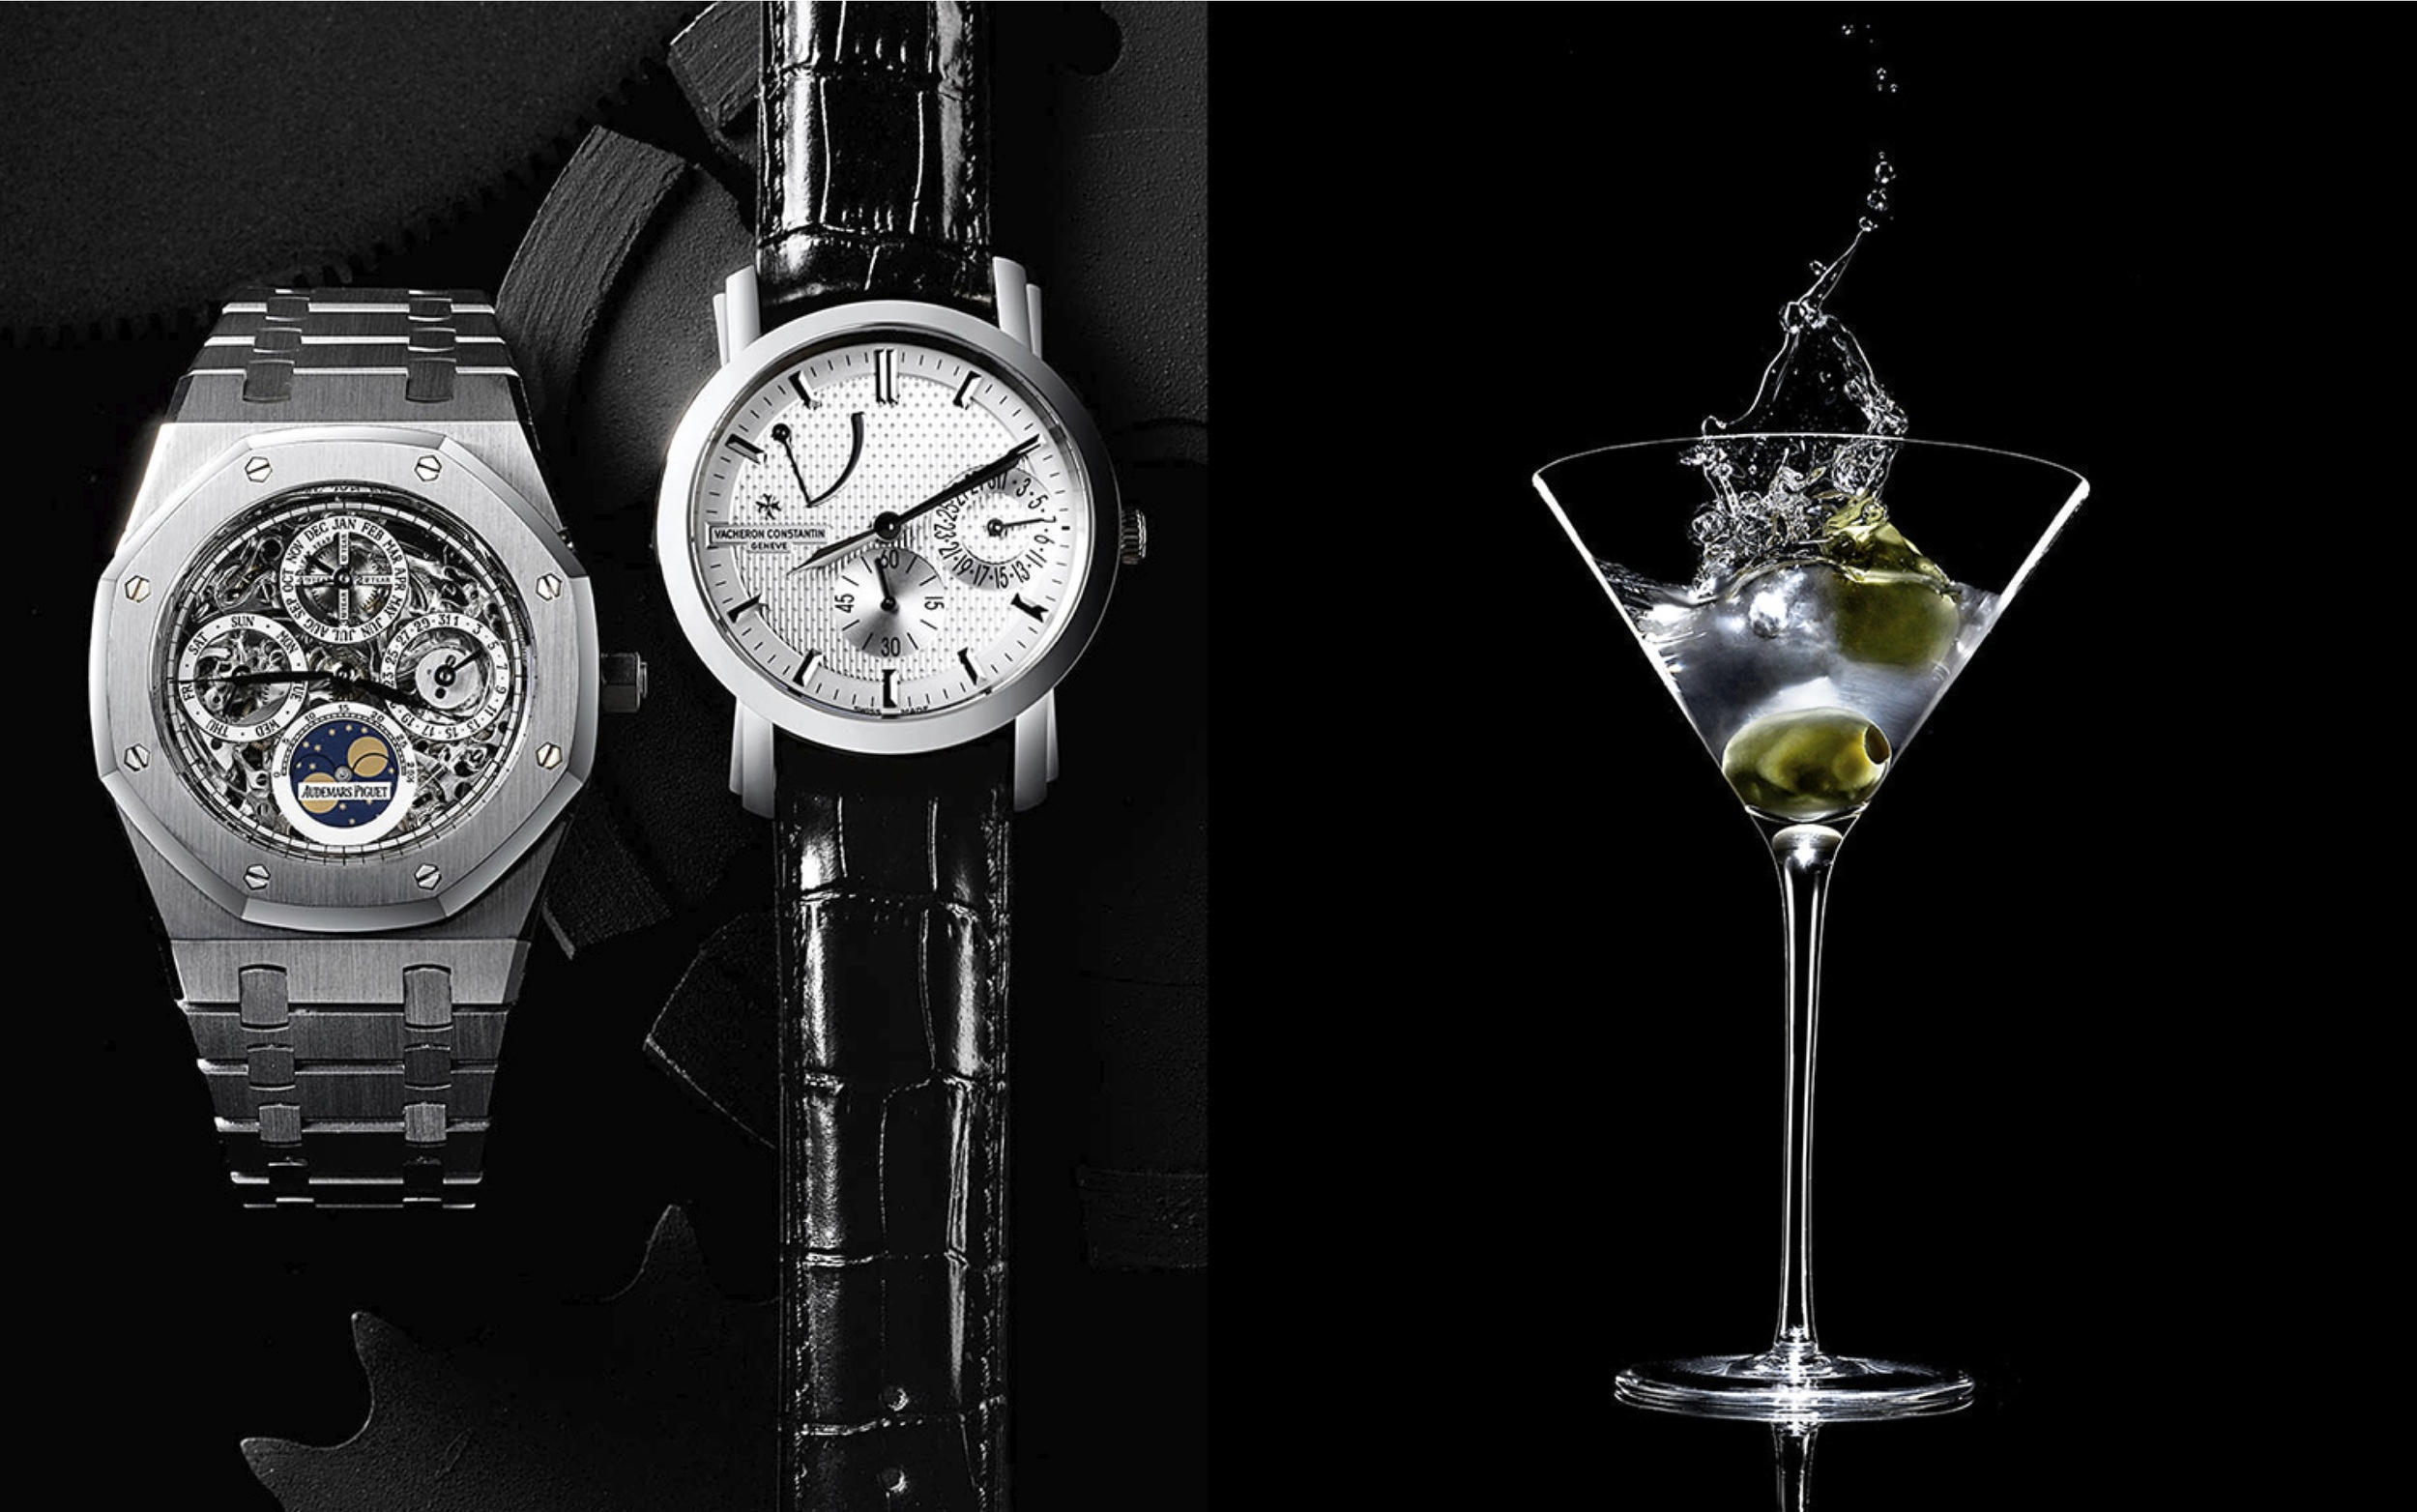 Watch_Drink_3.jpg